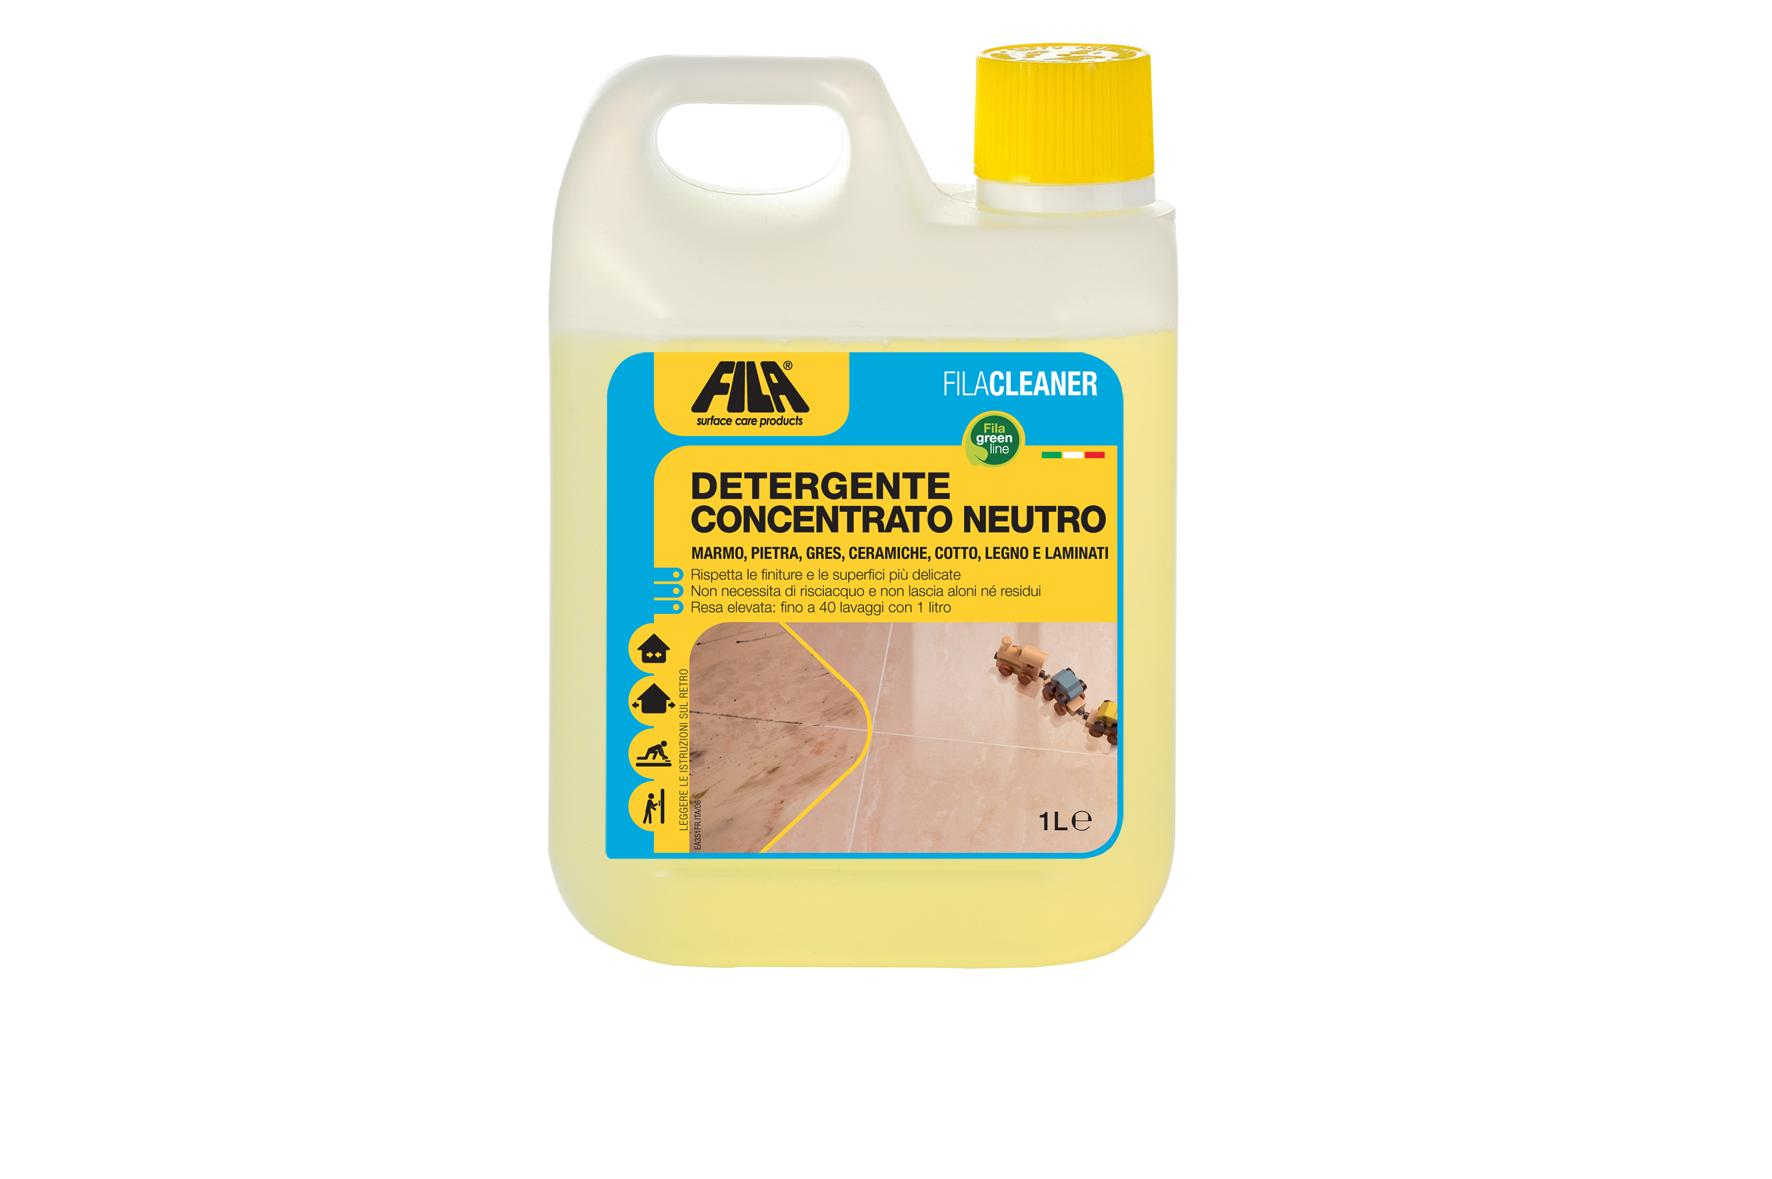 Detergente Concentrato Neutro Filacleaner 1lt FILA